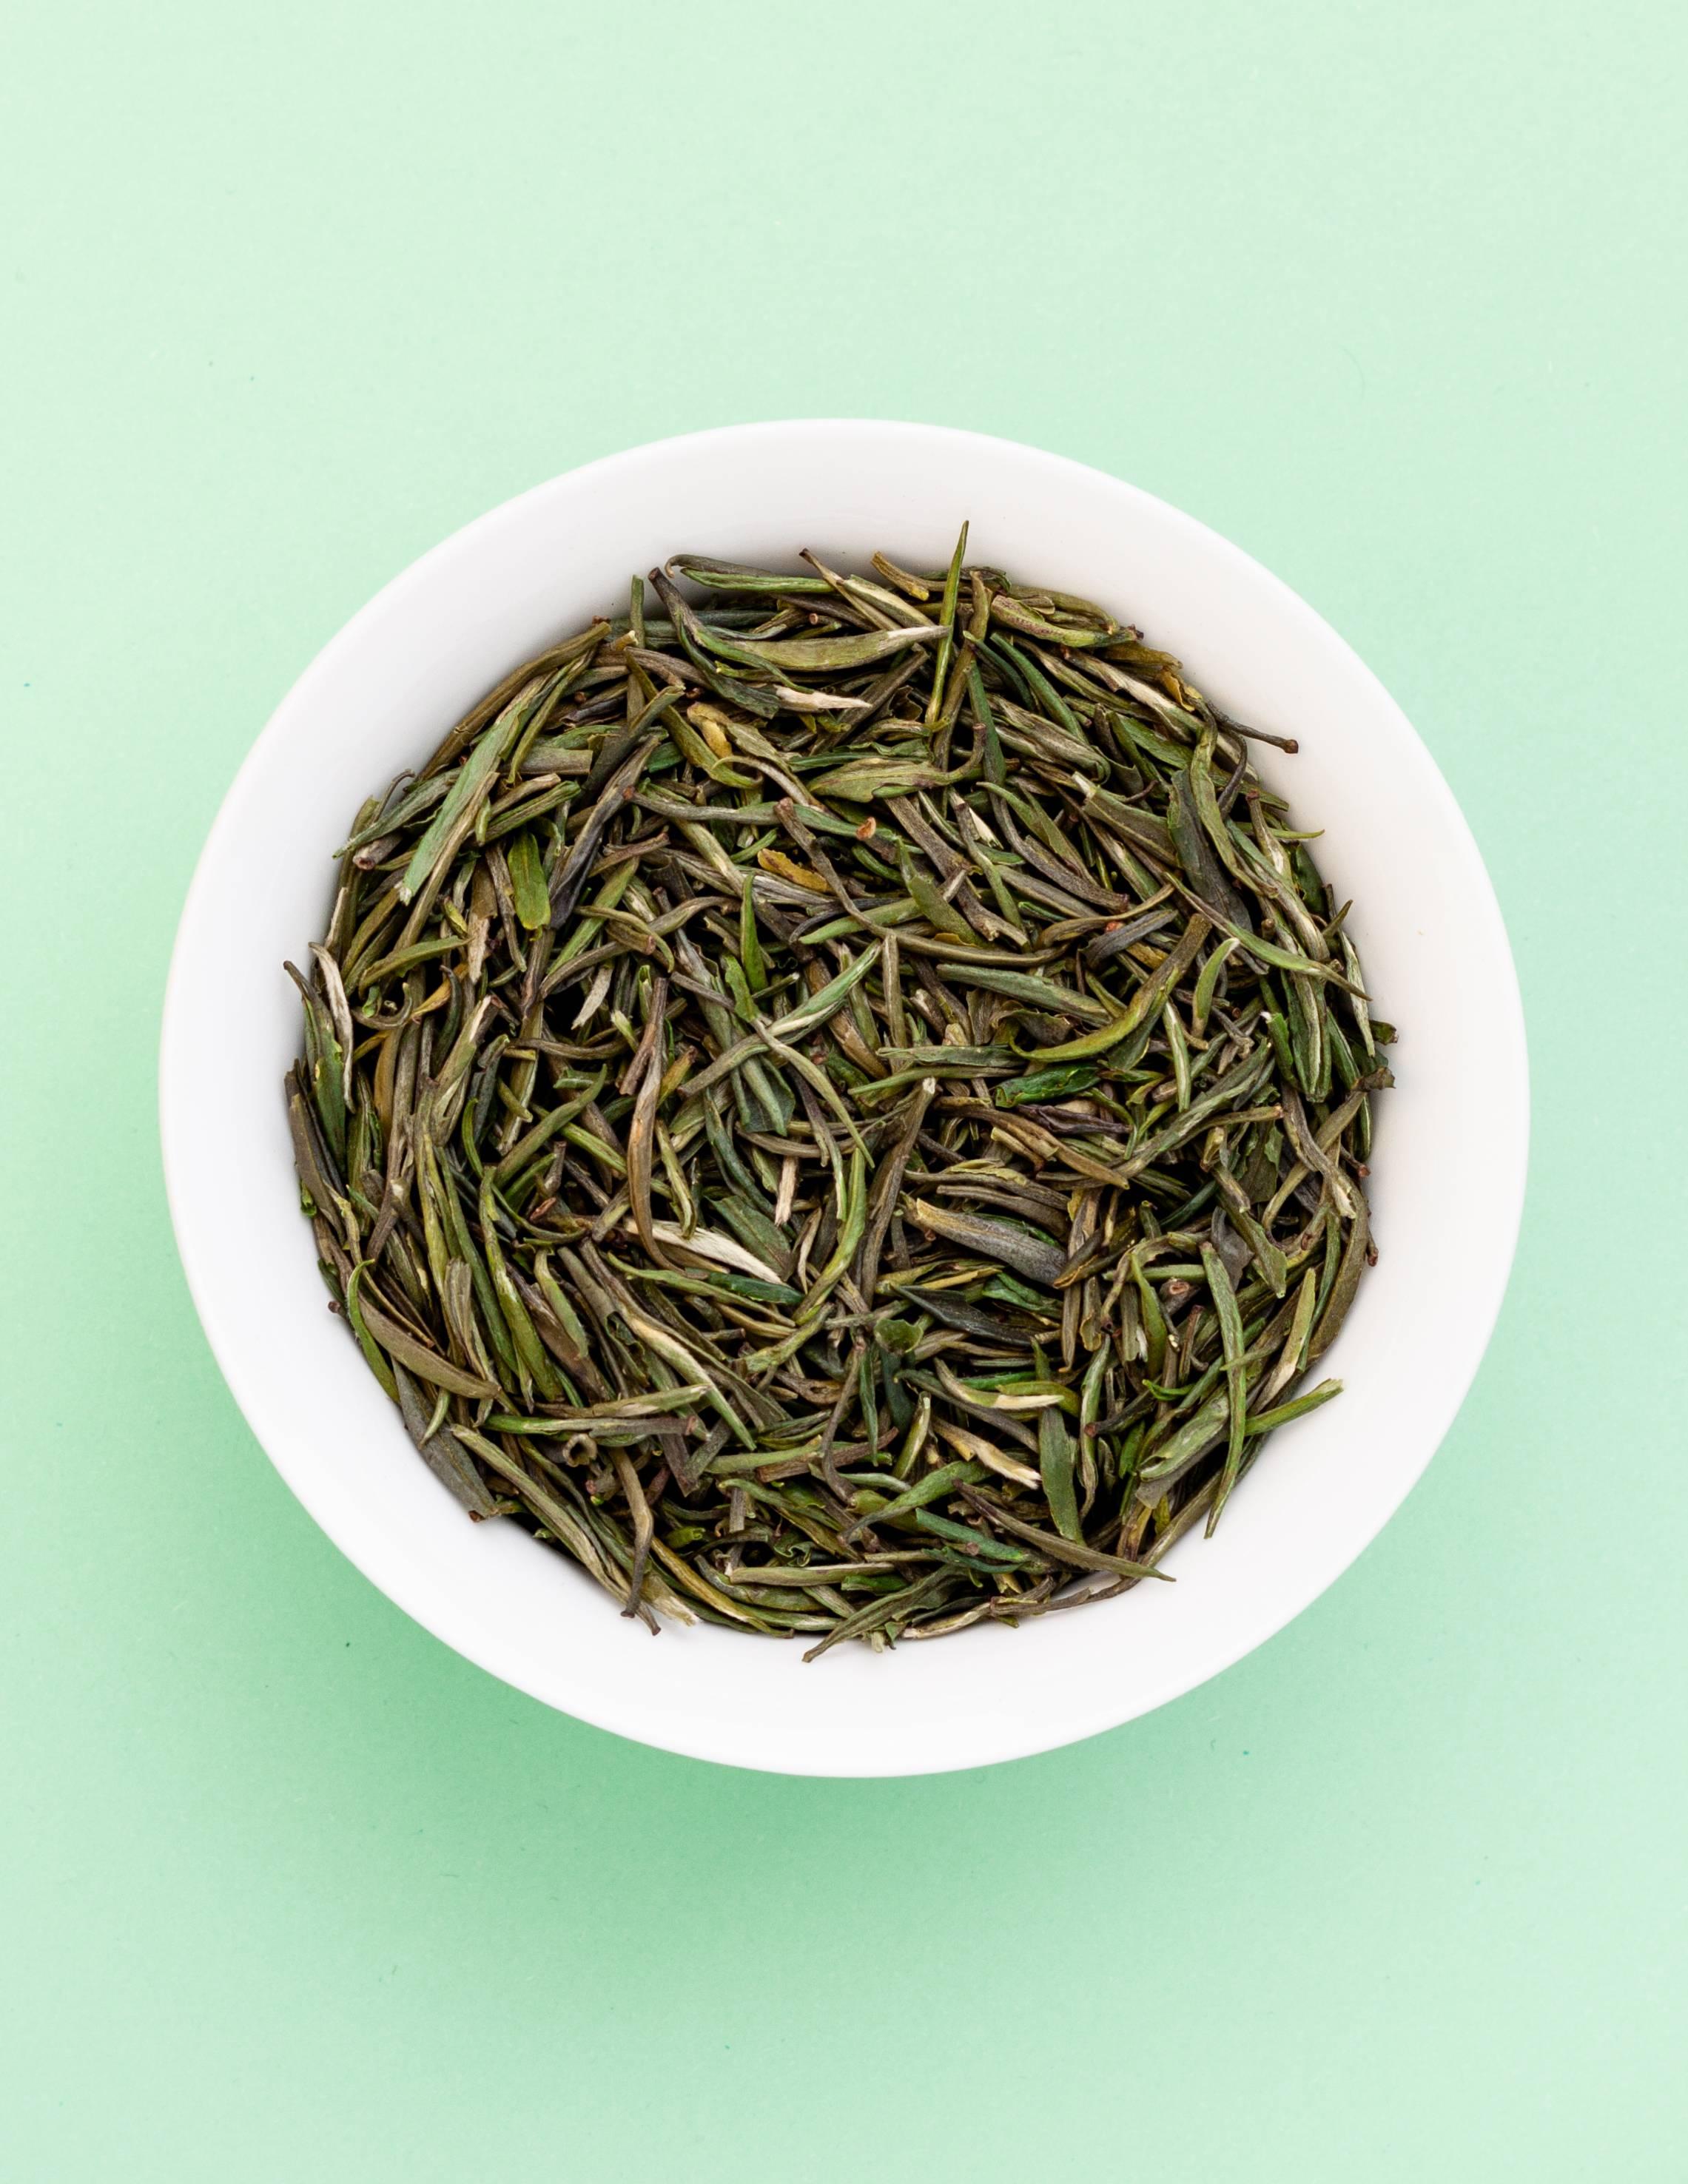 Гу чжу цзы сунь, 顾渚紫笋, пурпурные ростки с горы гу чжу. любимый чай лу юя - teaterra | teaterra